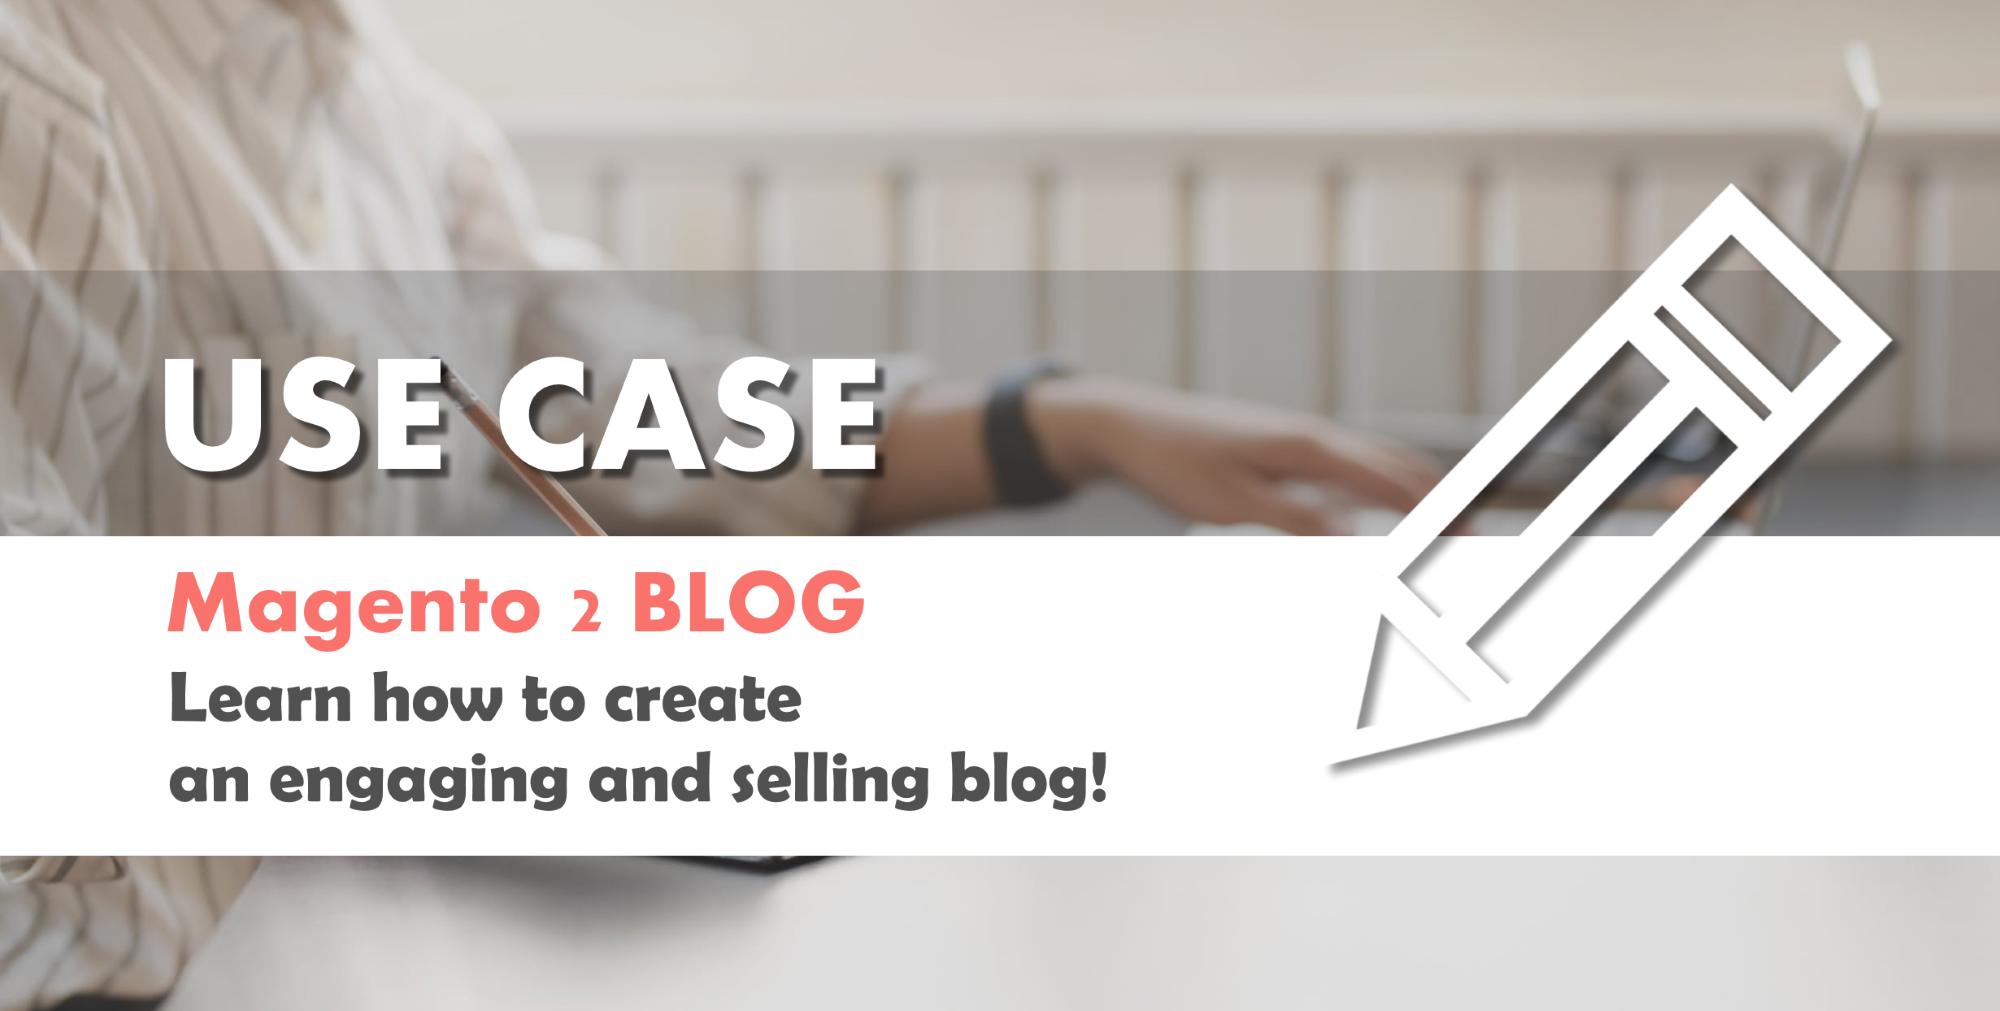 Magento 2 Blog Use Cases